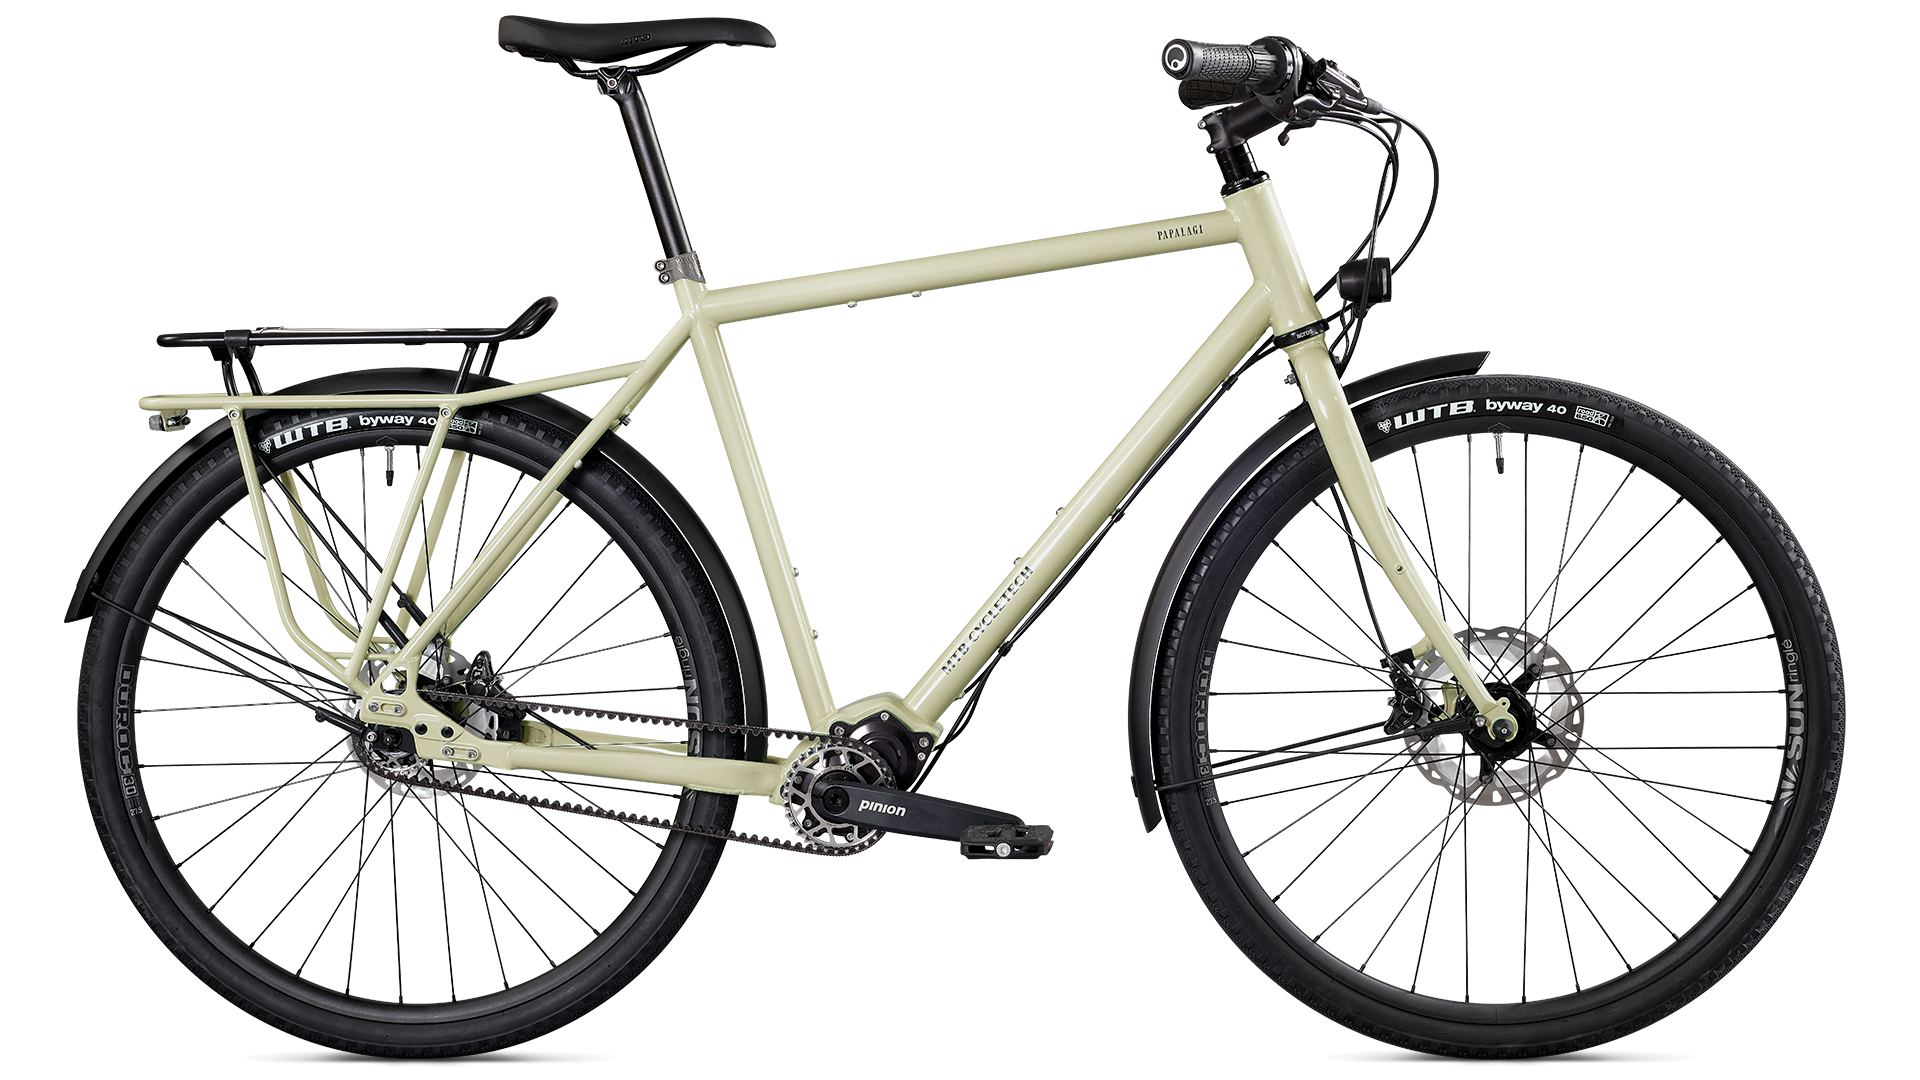 Modell - Papalagi GPi - MTB Cycletech